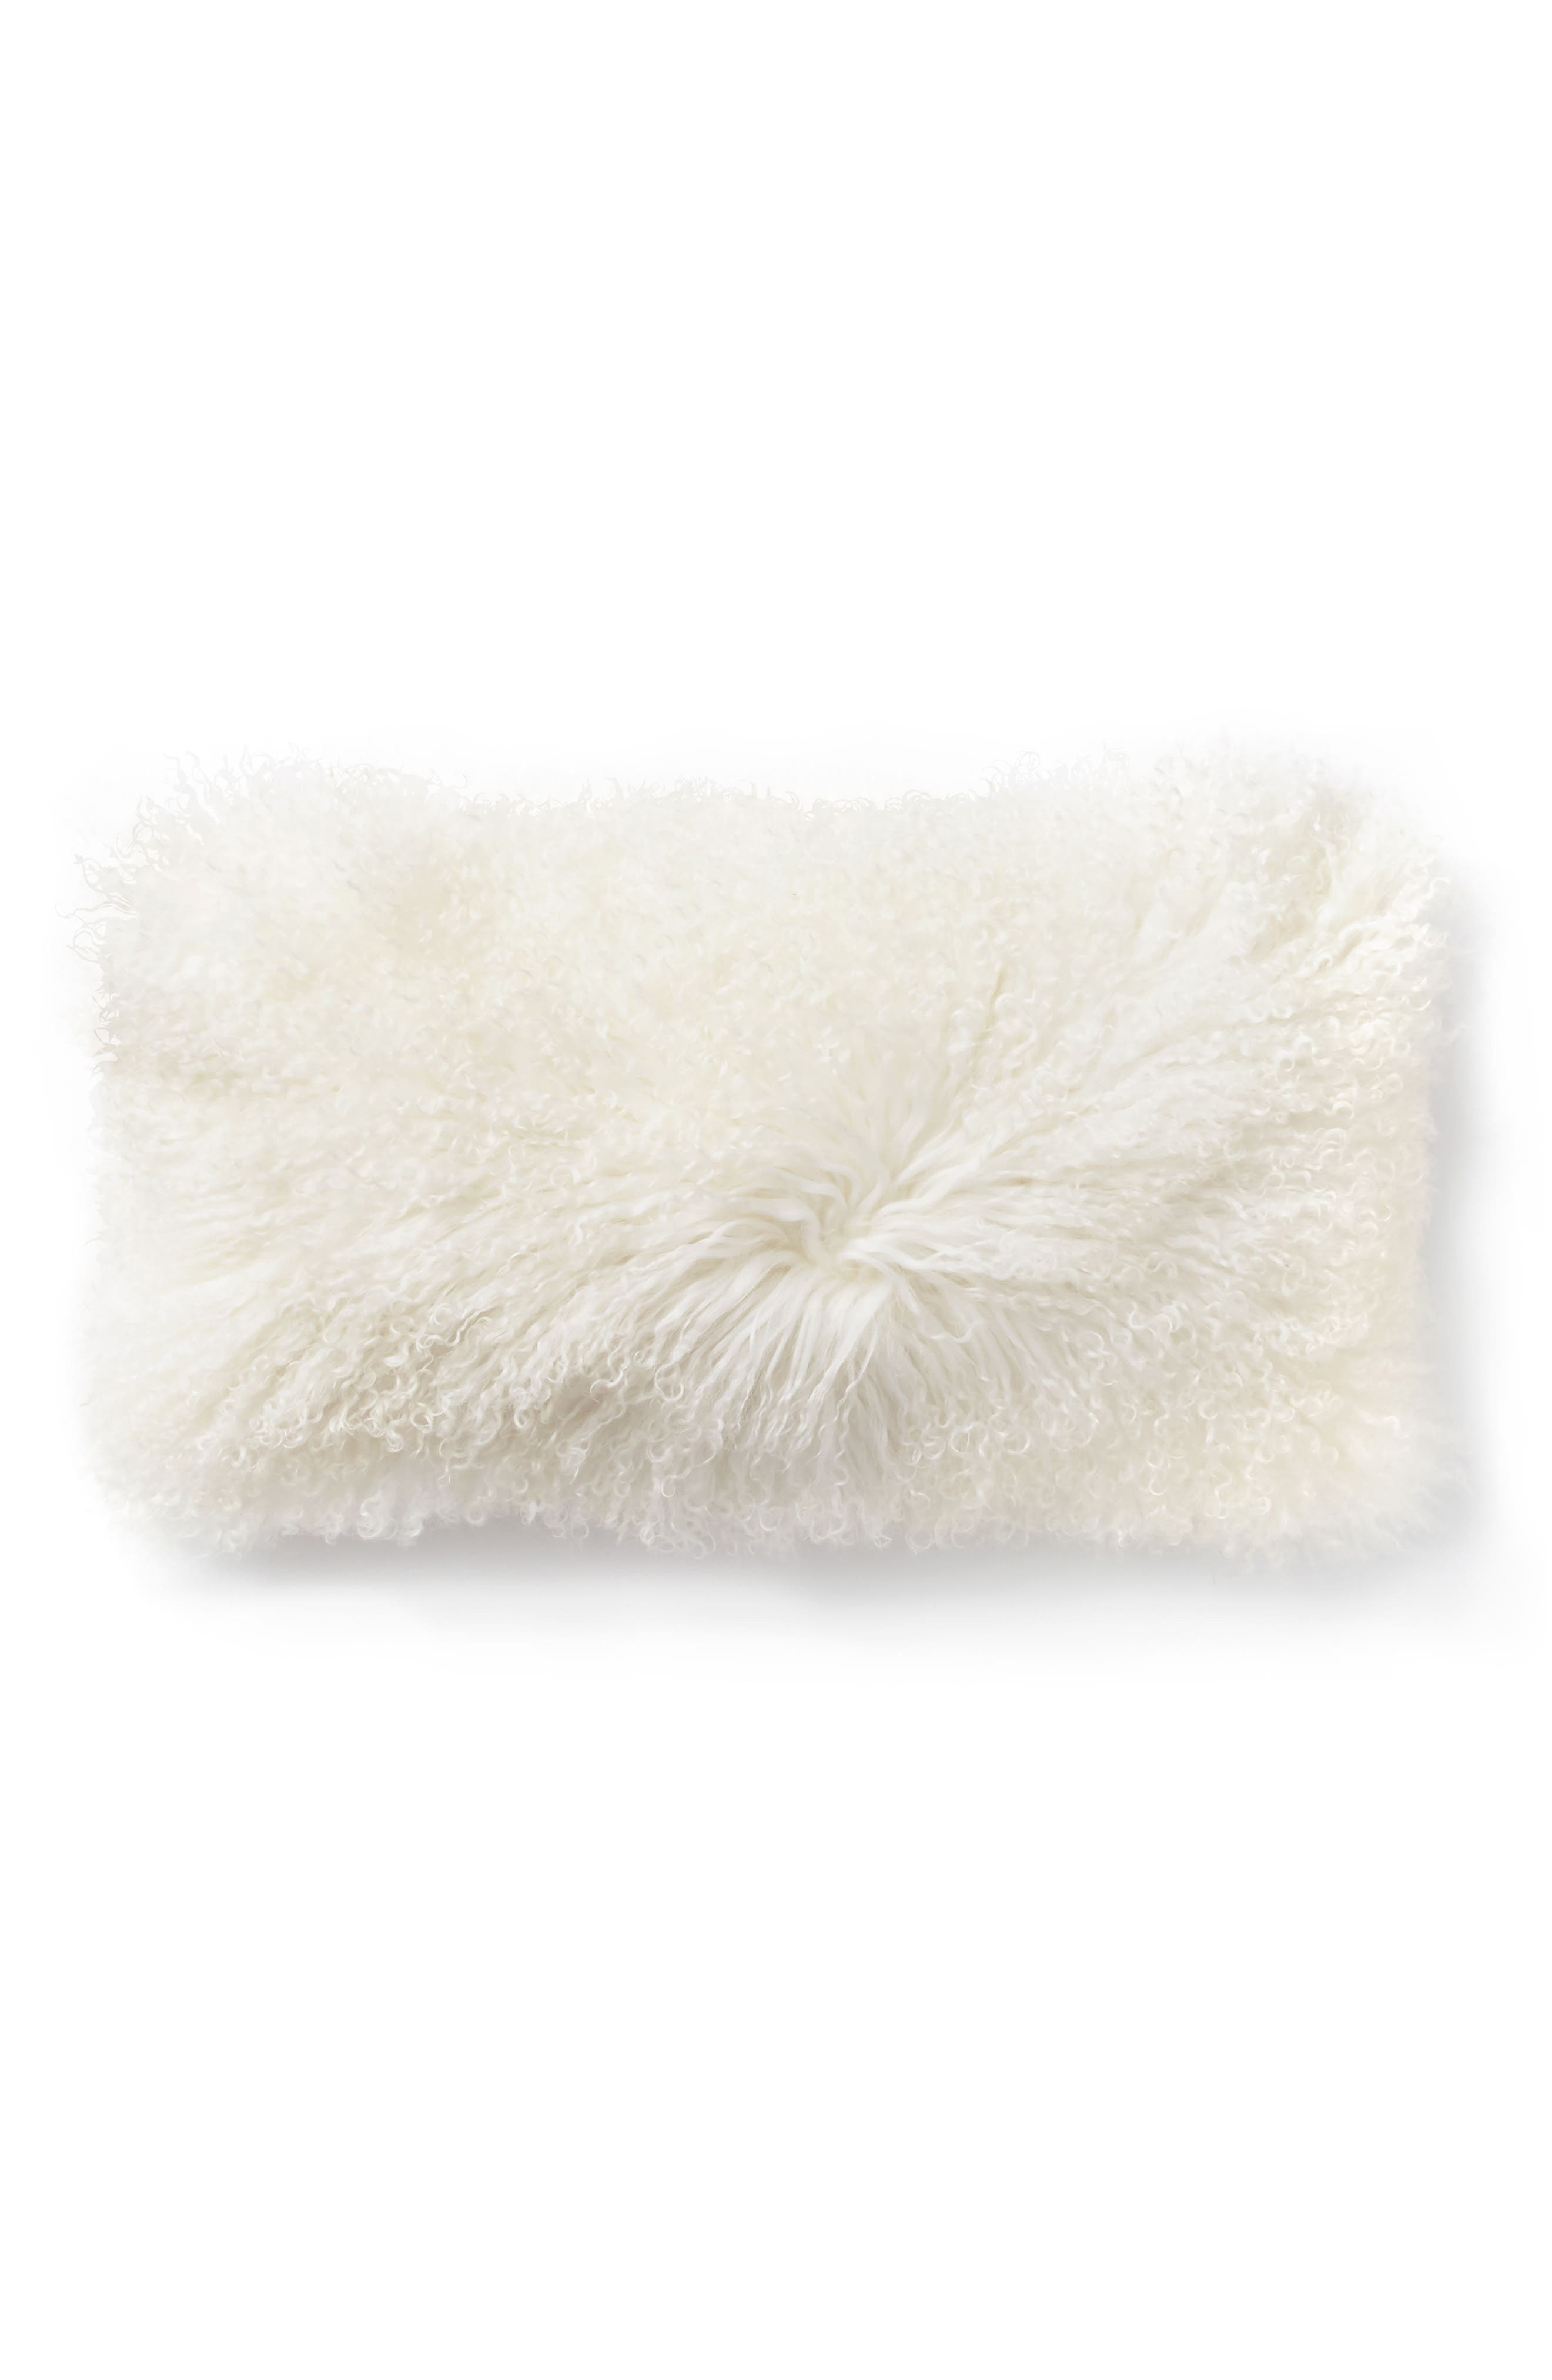 DONNA KARAN NEW YORK, Donna Karan Flokati Genuine Shearling Accent Pillow, Main thumbnail 1, color, IVORY